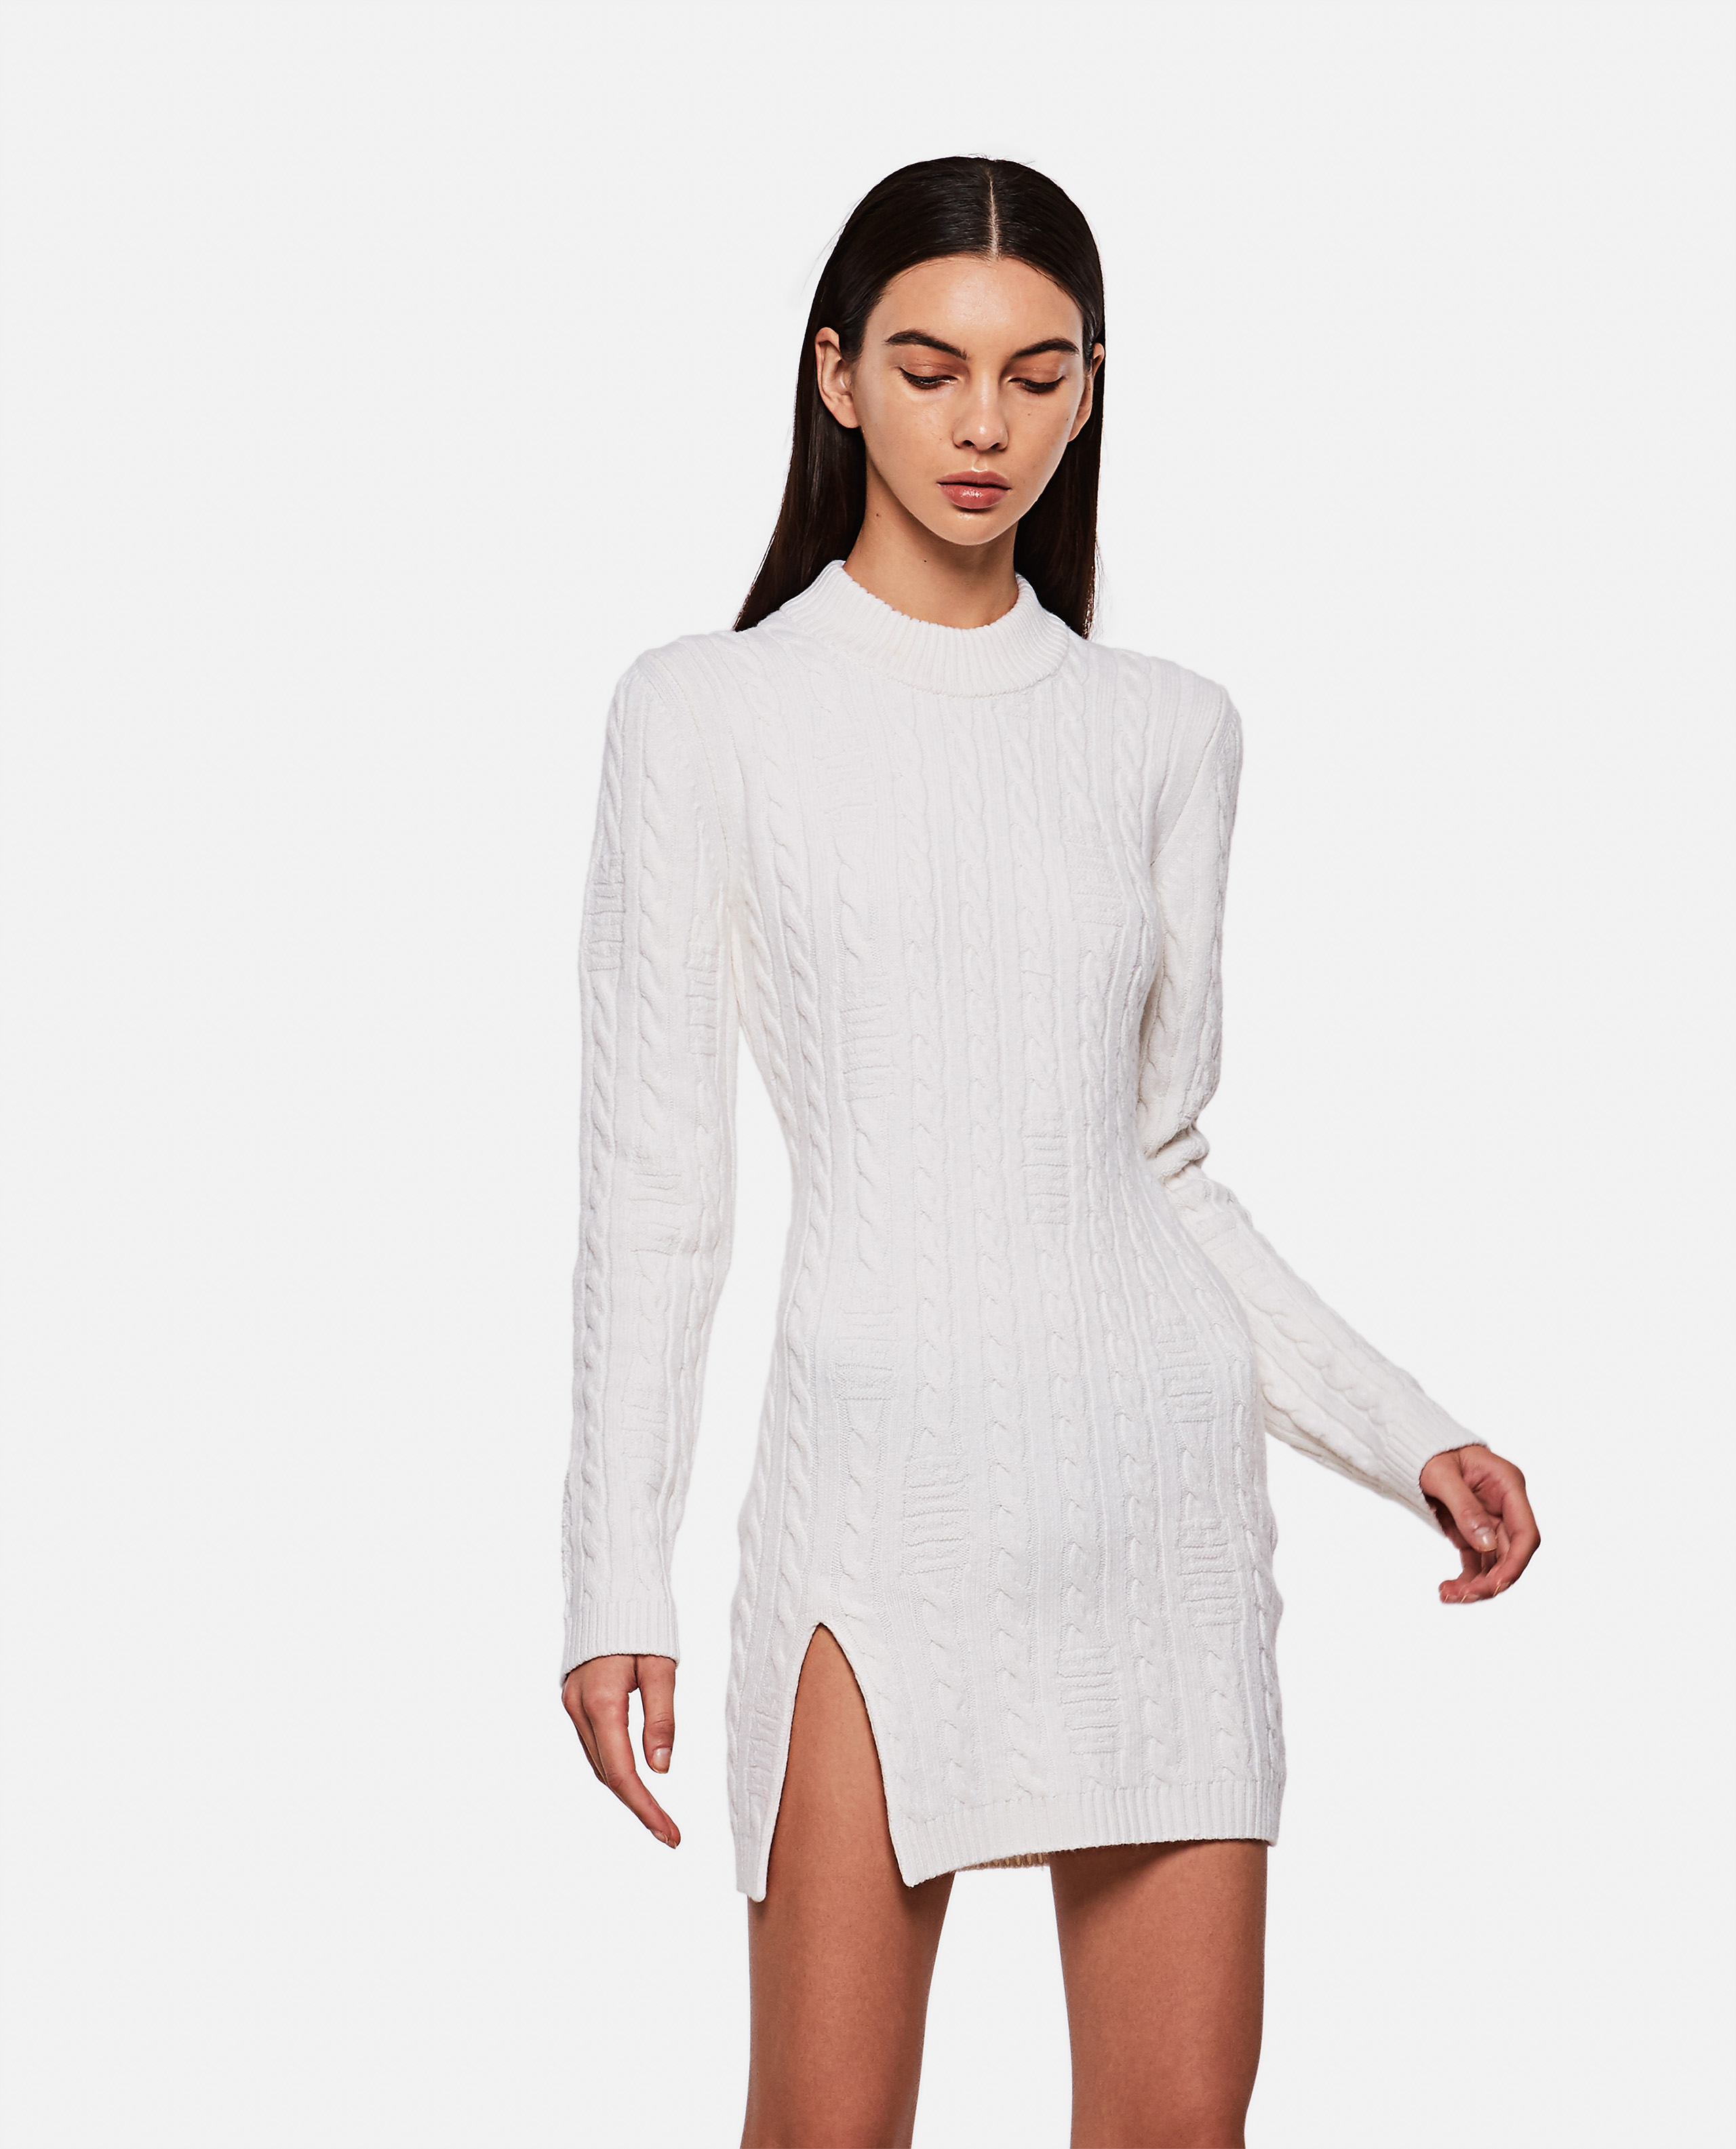 Woven wool dress